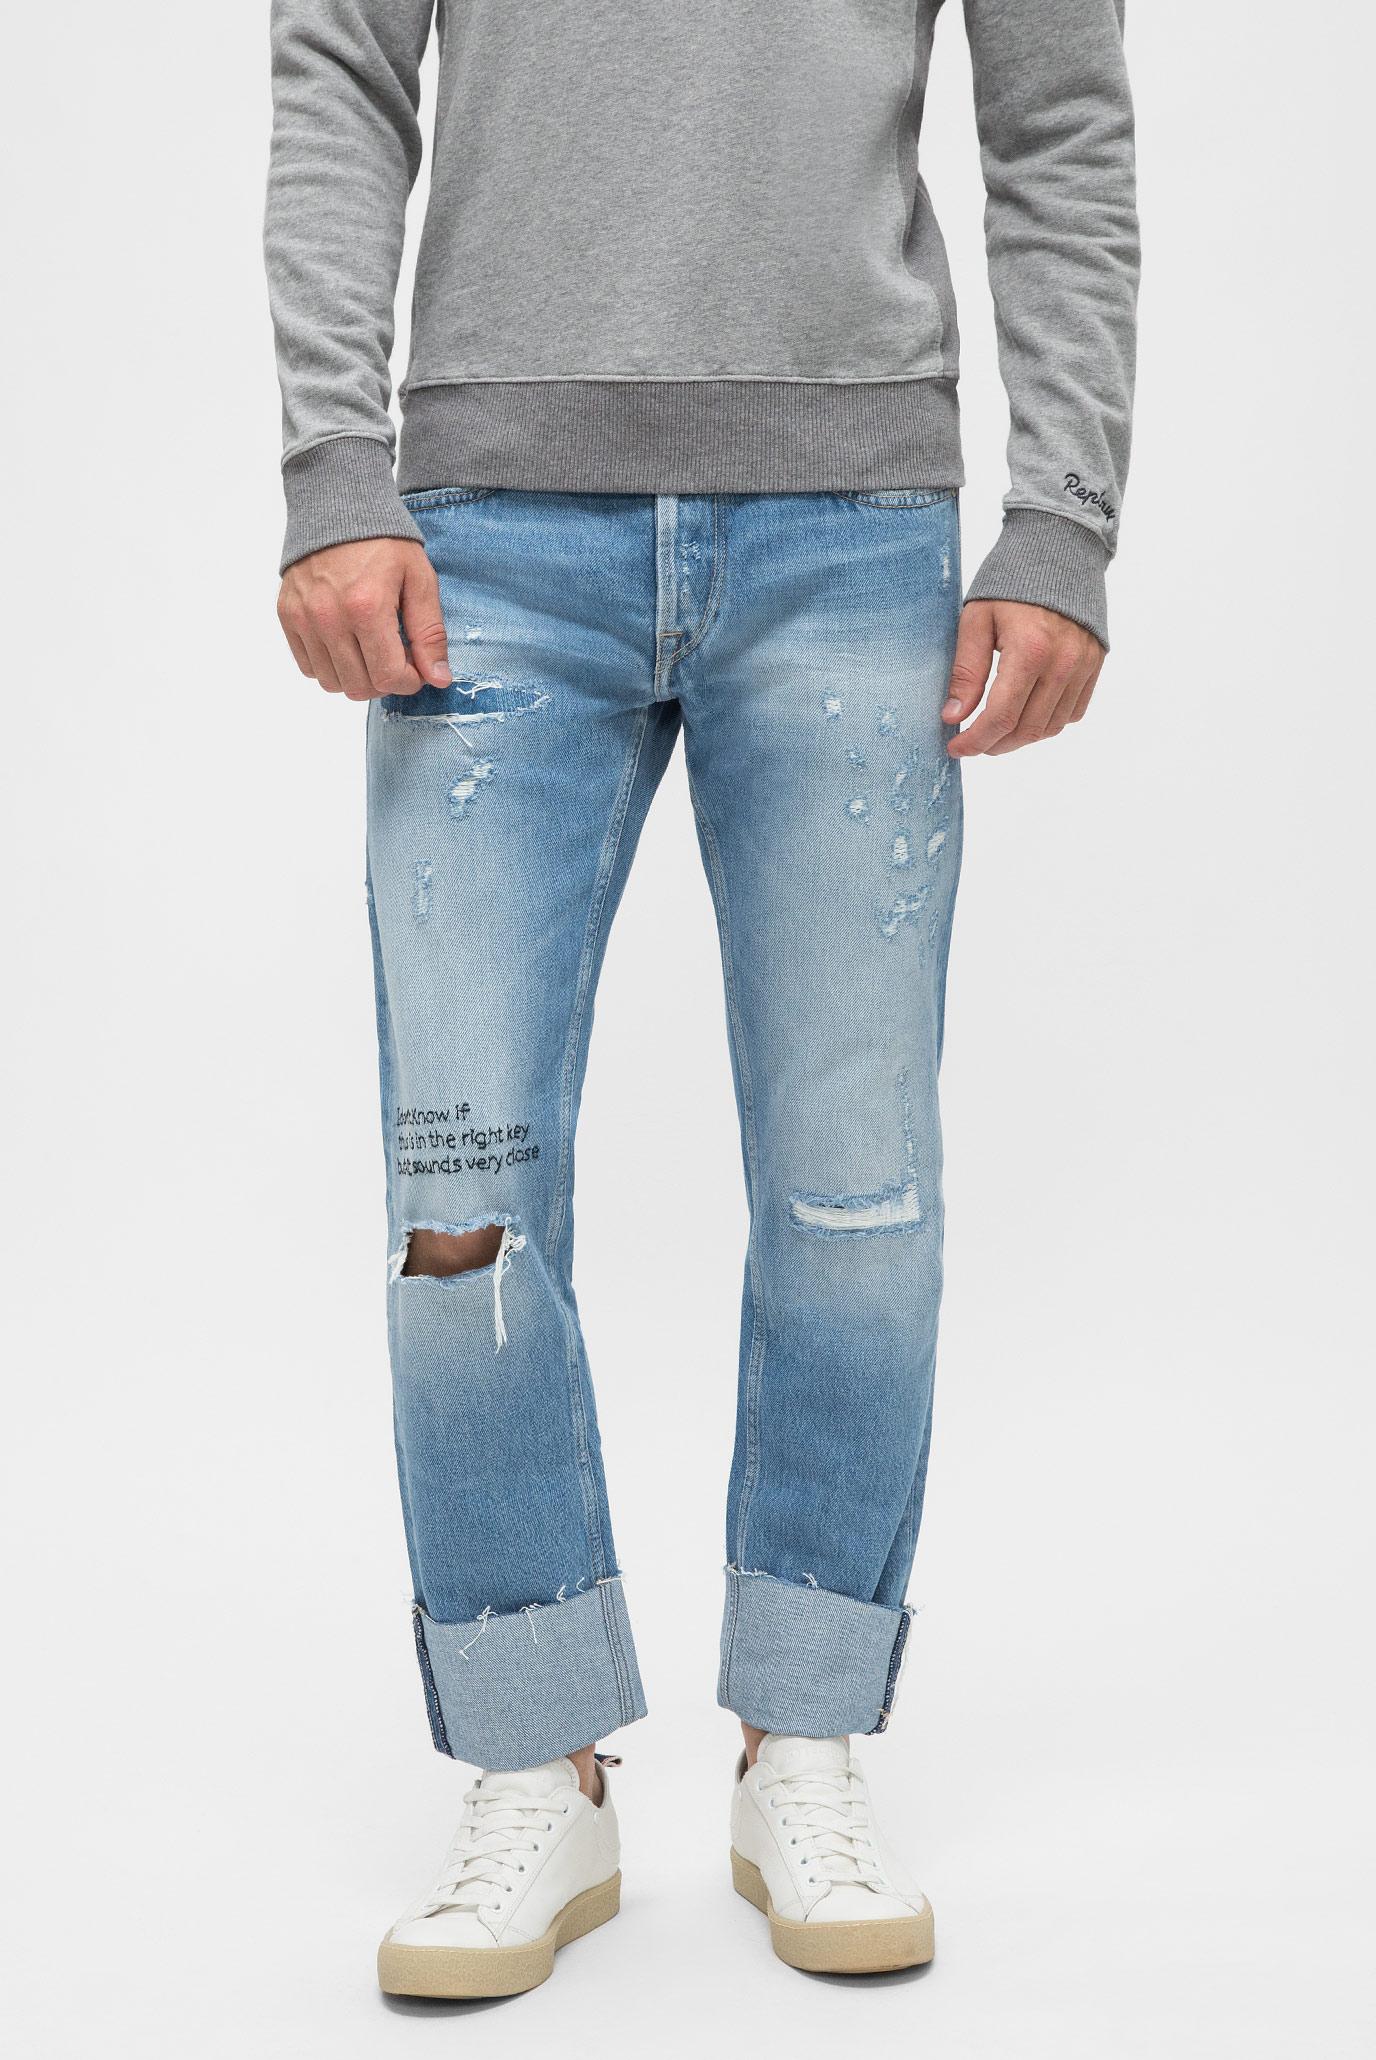 Мужские голубые джинсы GROVER Replay MA972V.000.108 D16 — MD-Fashion, баркод 8054381795910